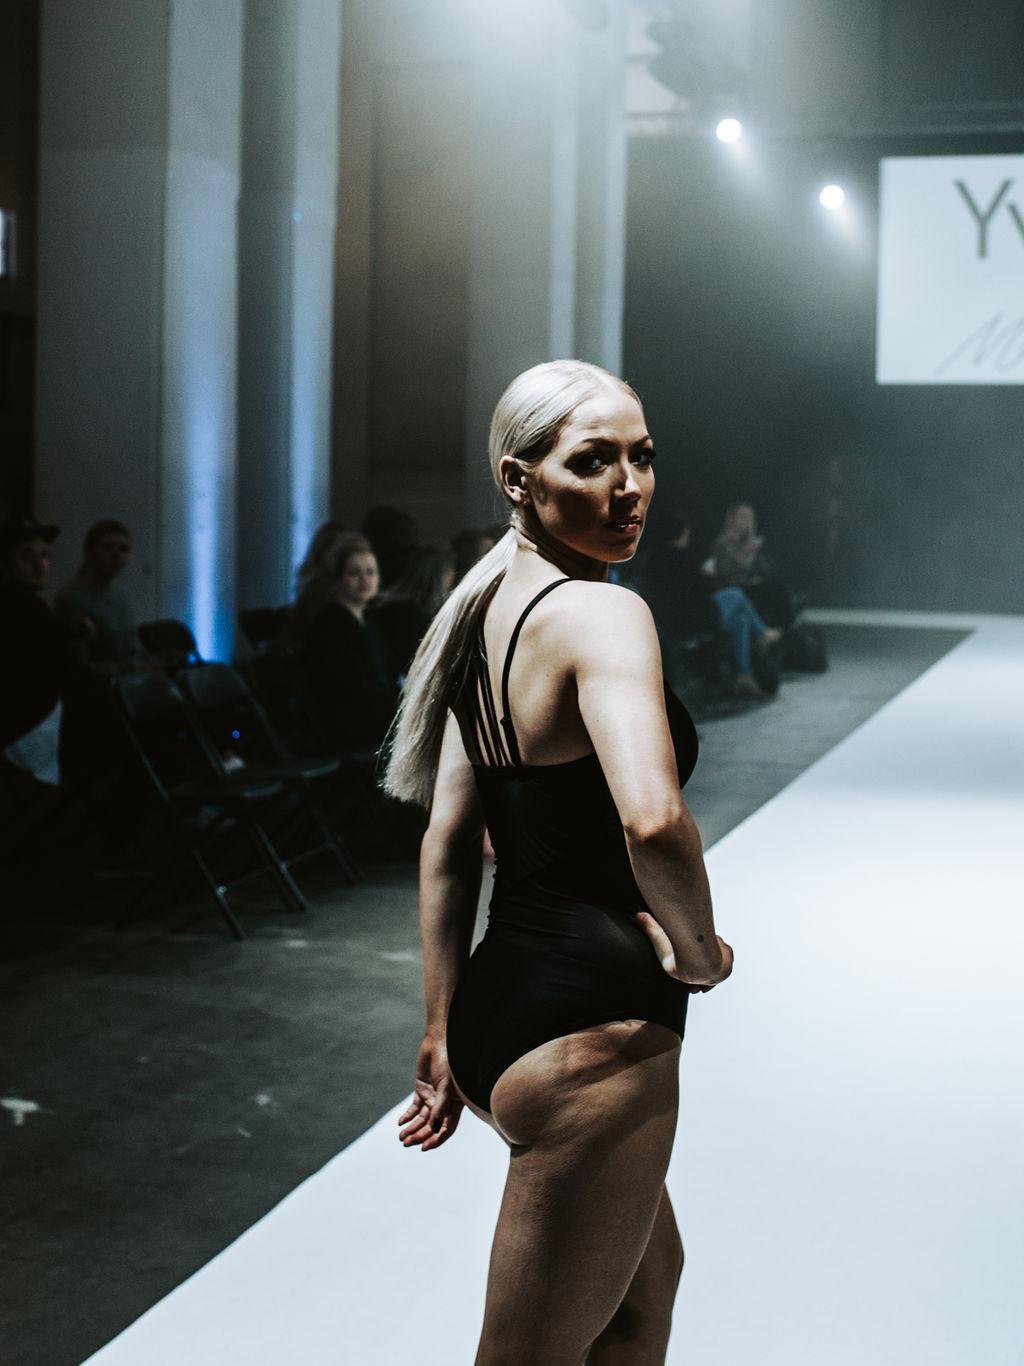 20190515_Yvette_X_Martina_Lili_Nissila-25.jpg